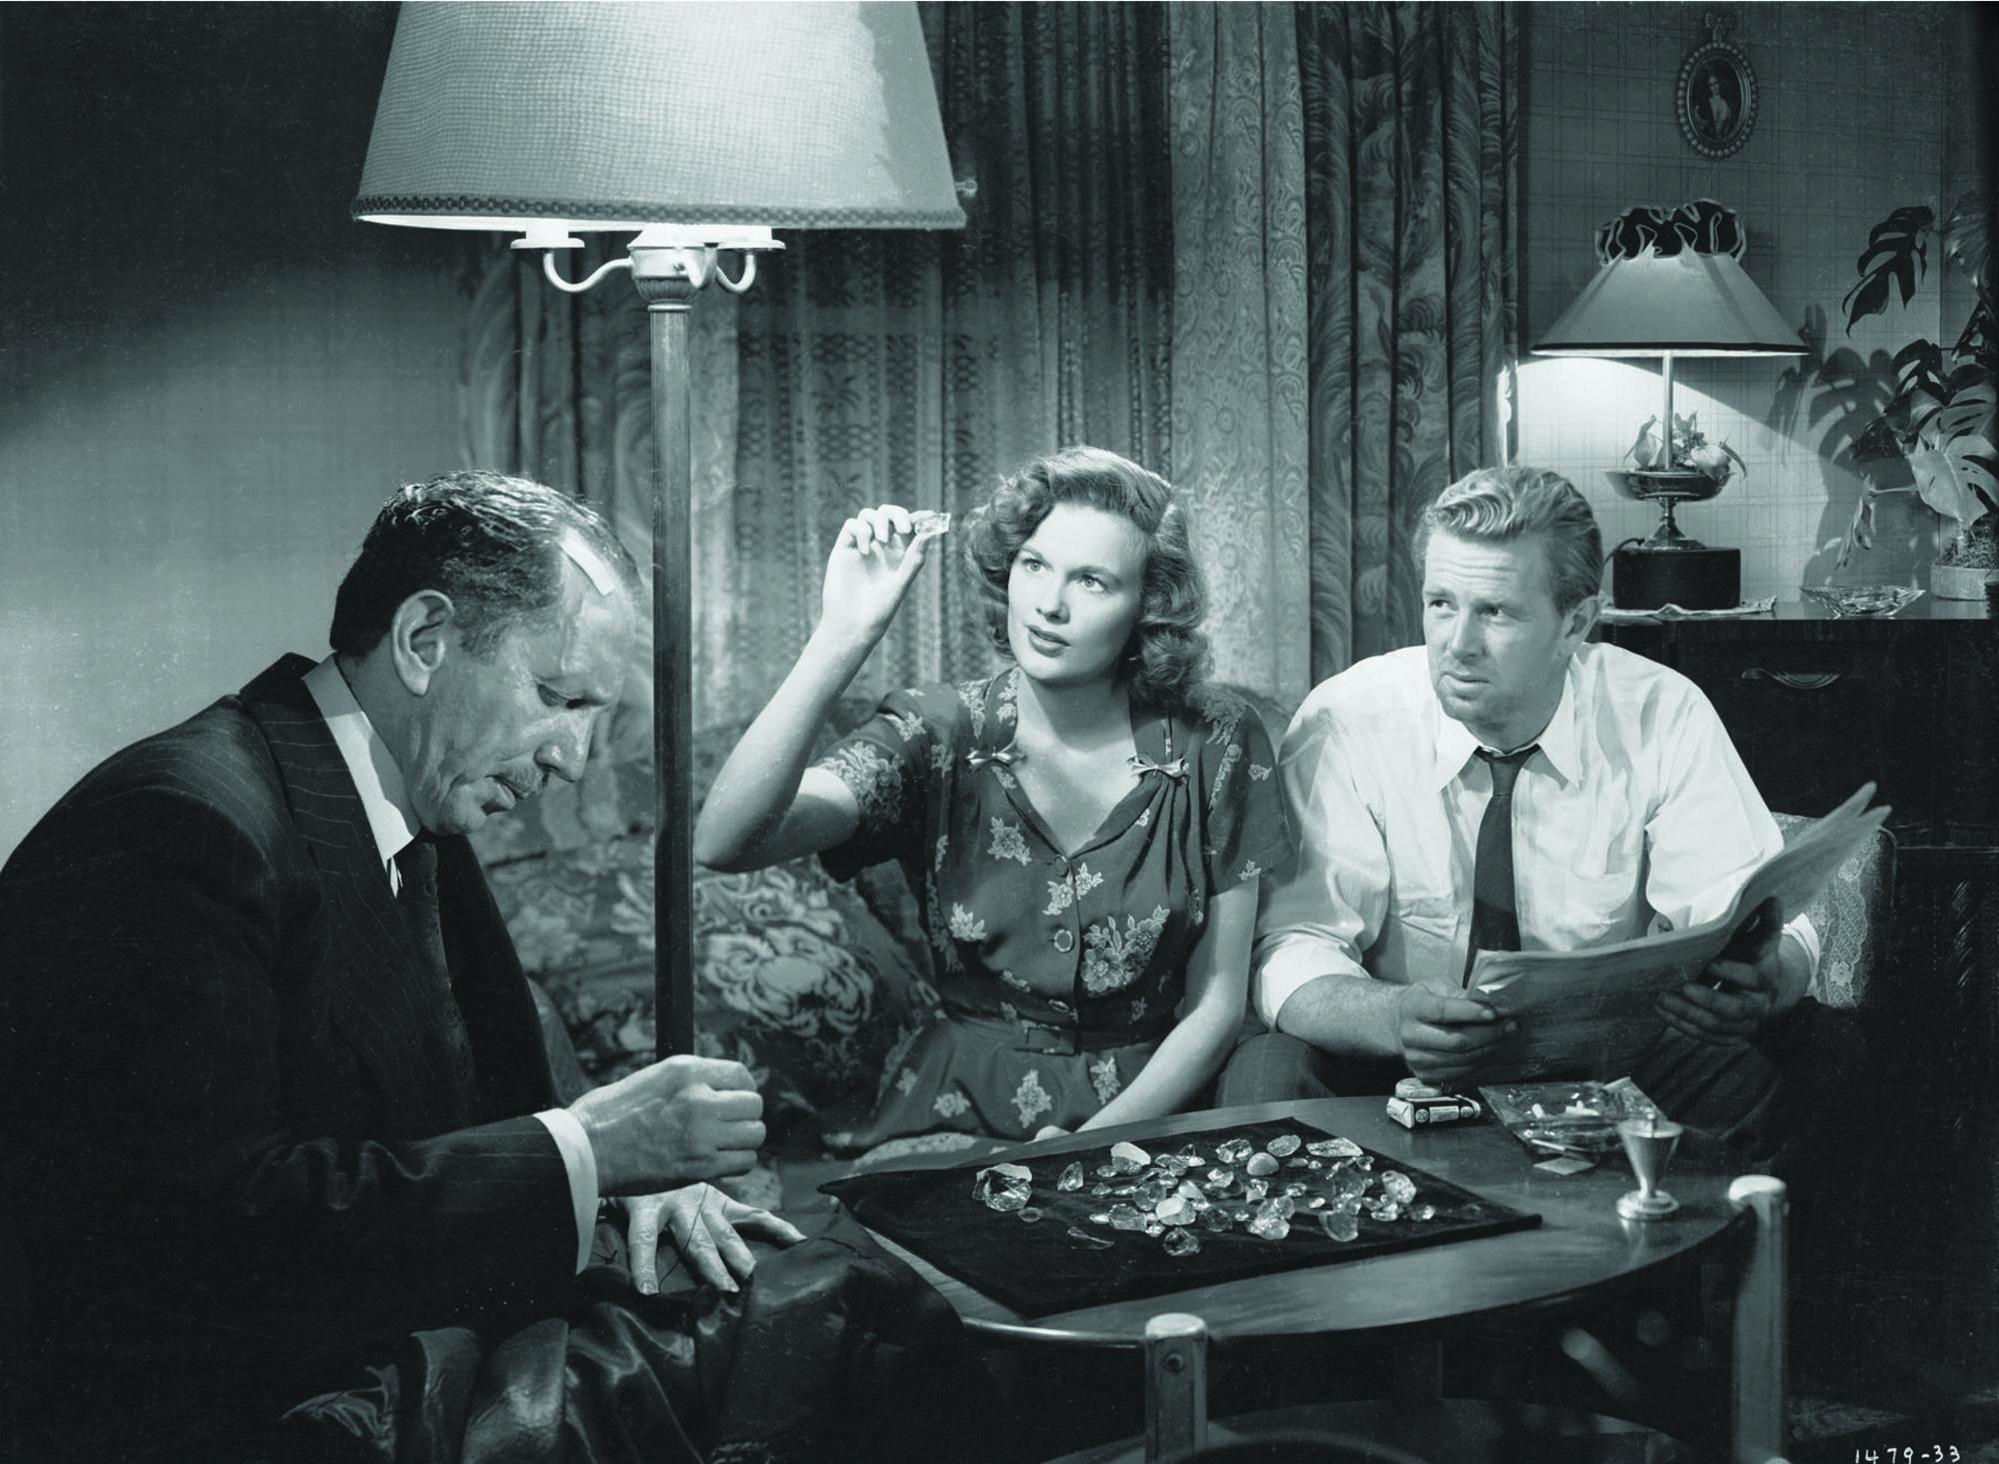 Sterling Hayden, Jean Hagen, and Sam Jaffe in The Asphalt Jungle (1950)